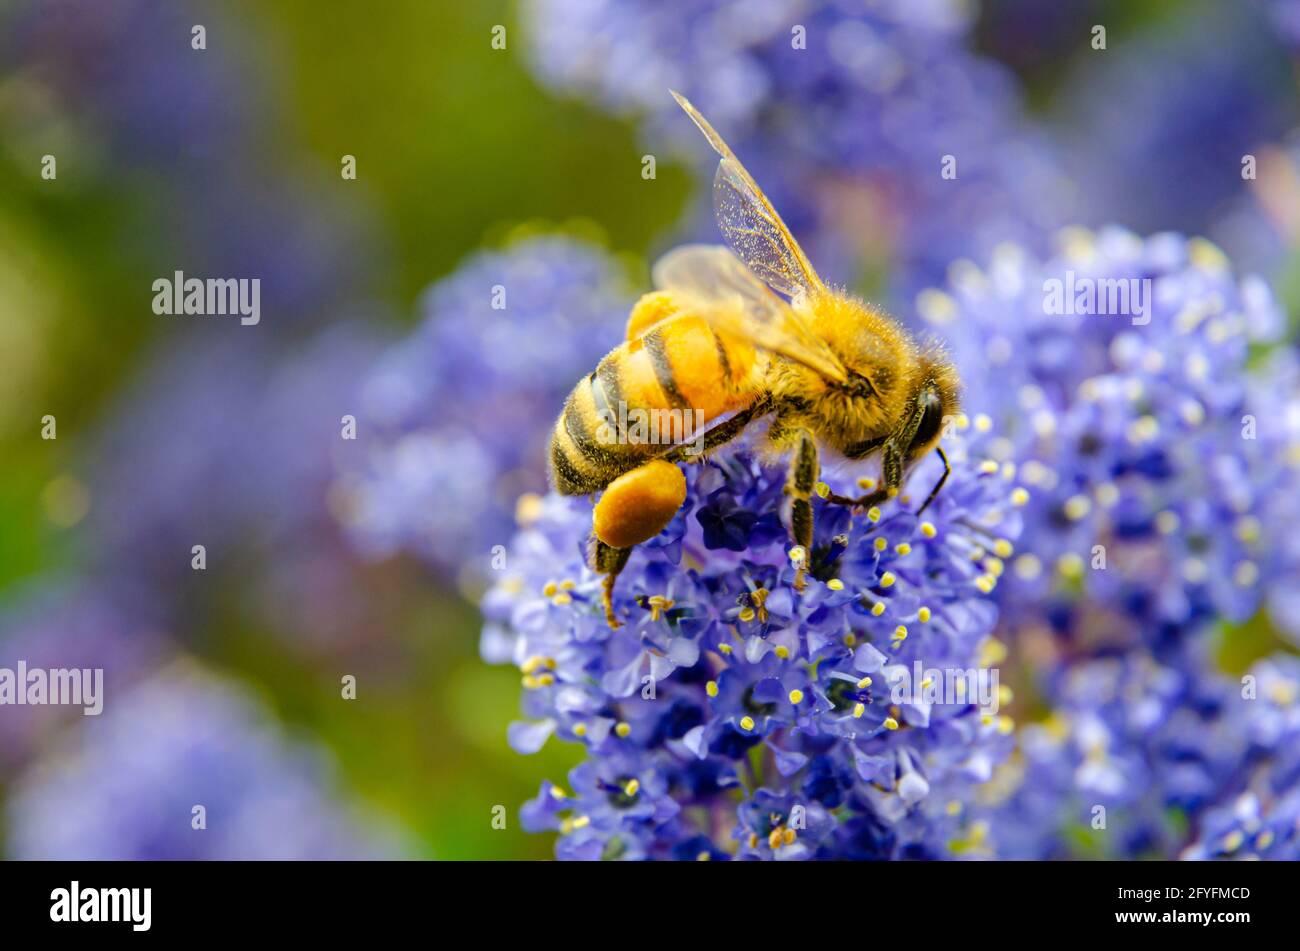 close-up-of-a-honey-bee-on-ceanothus-or-california-lilac-flowers-2FYFMCD.jpg